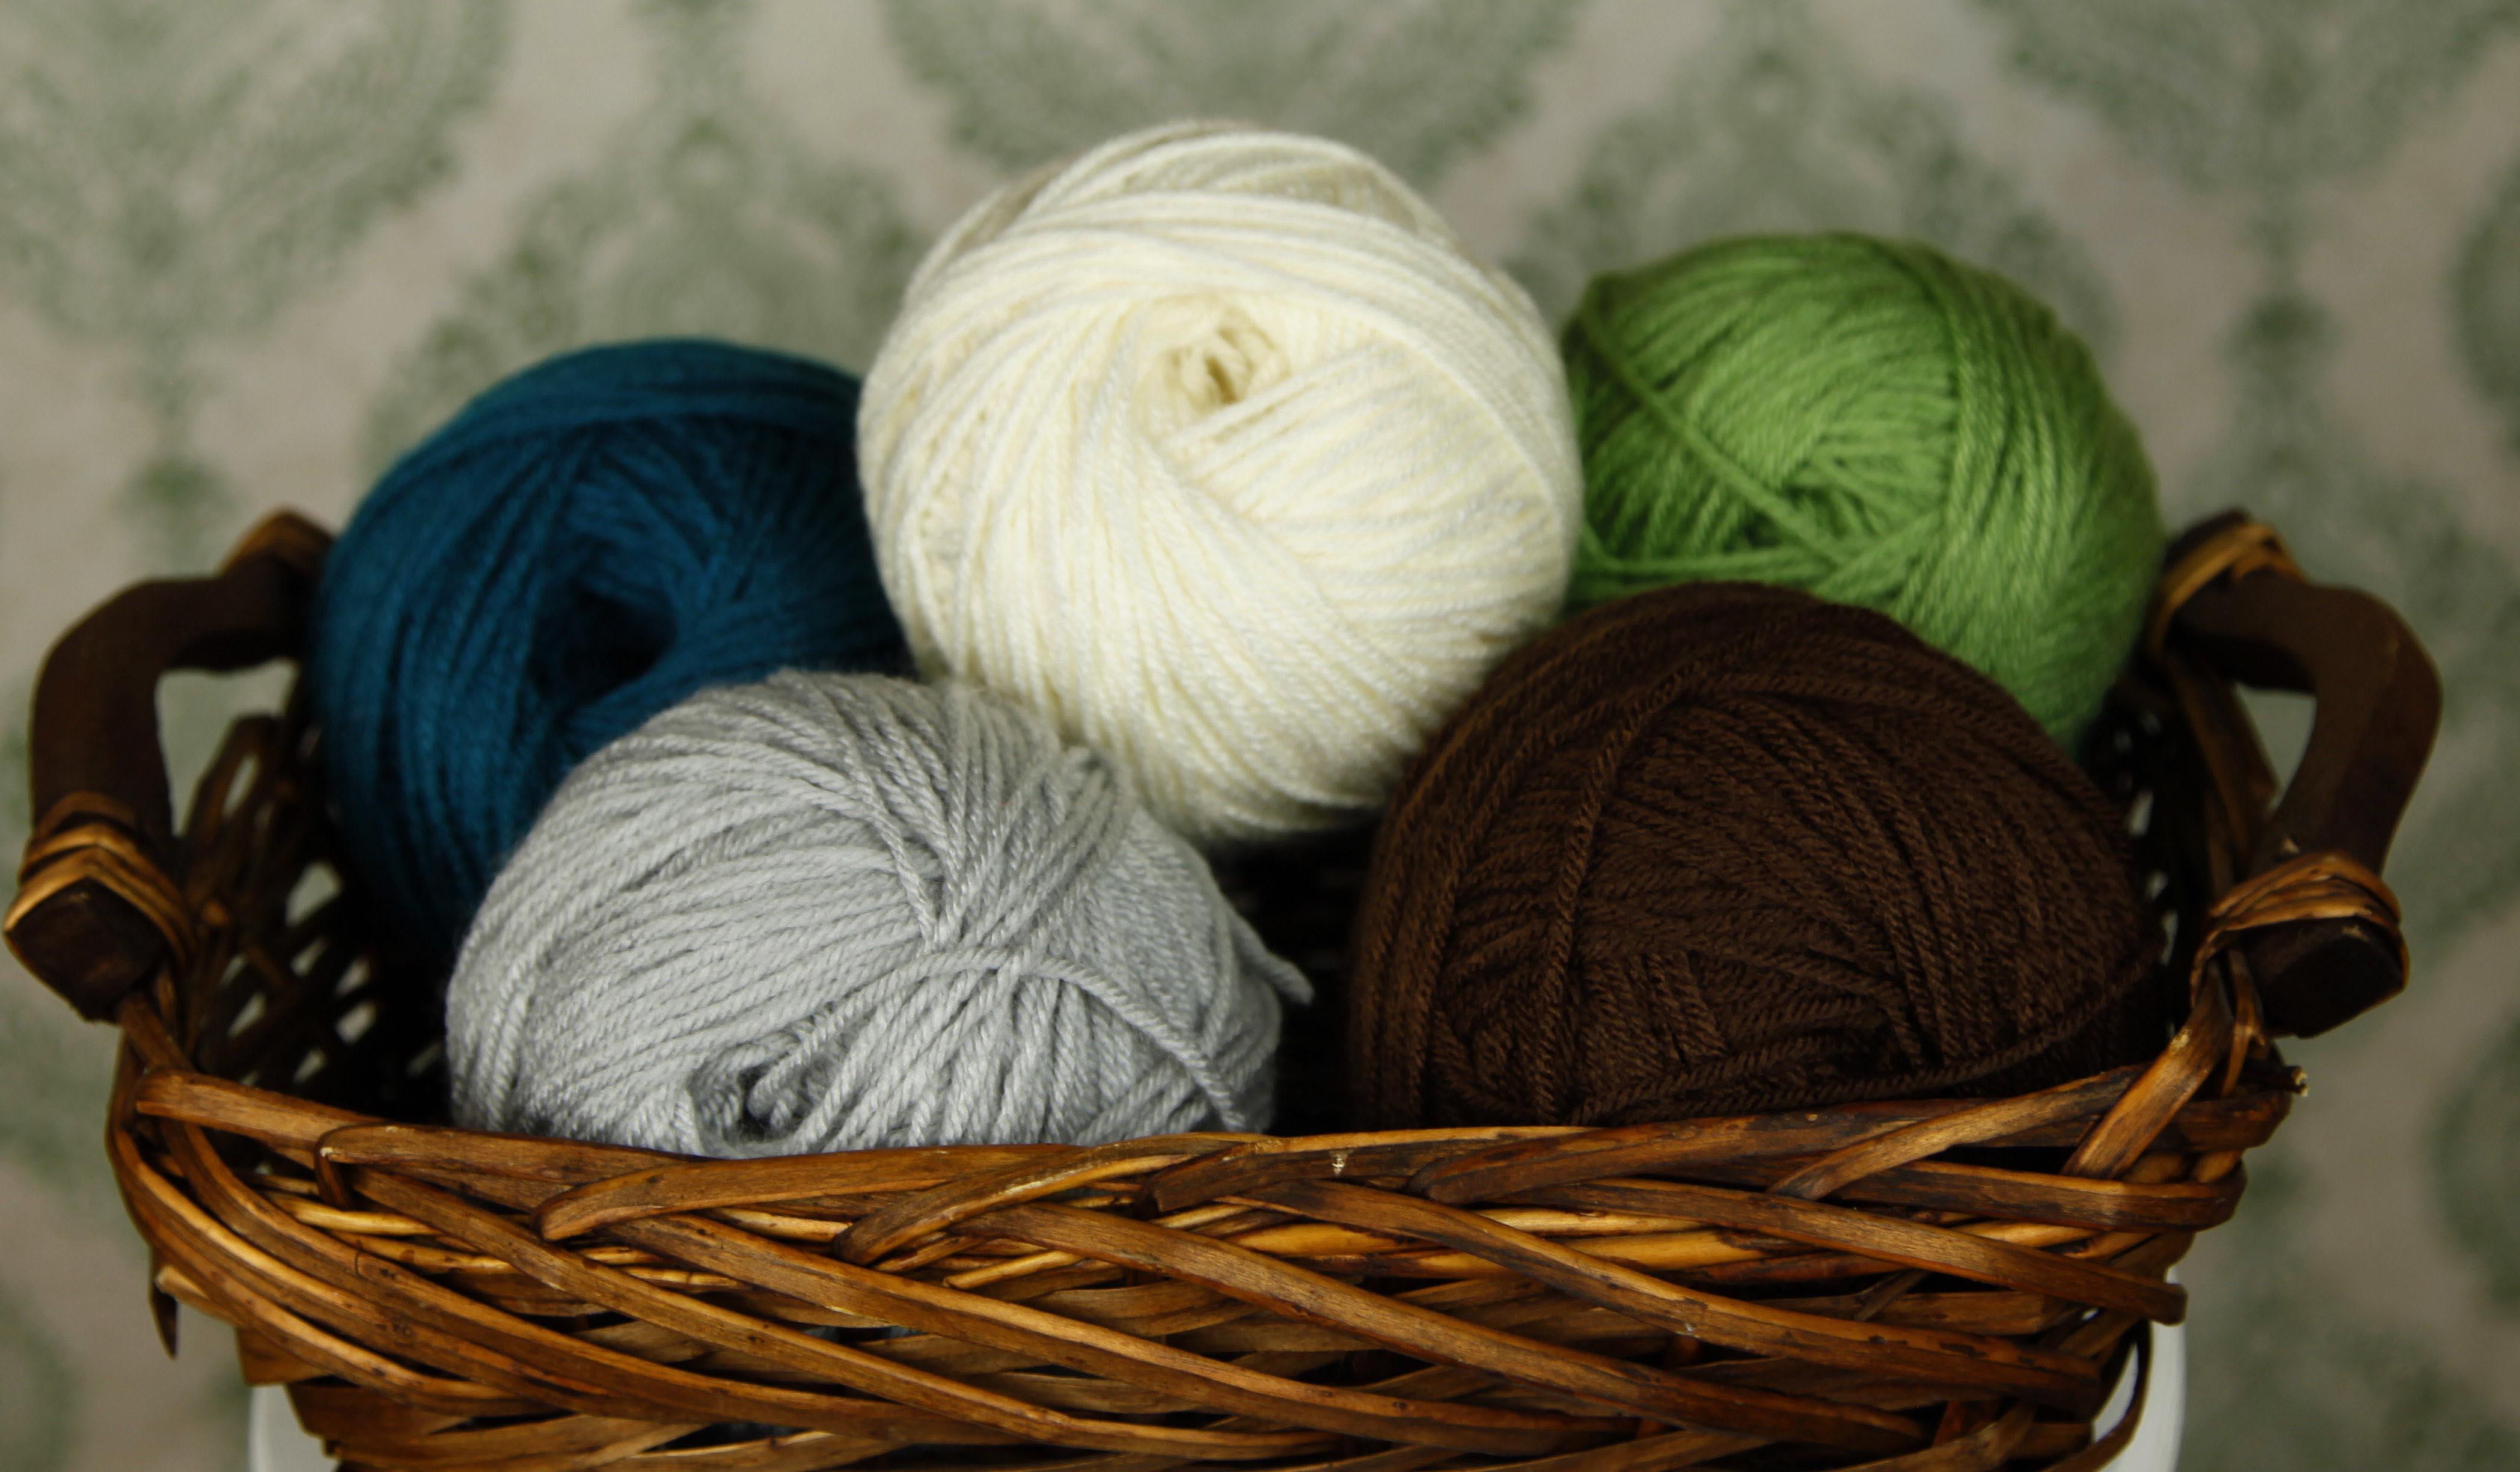 Wicker basket holding balled up yarn